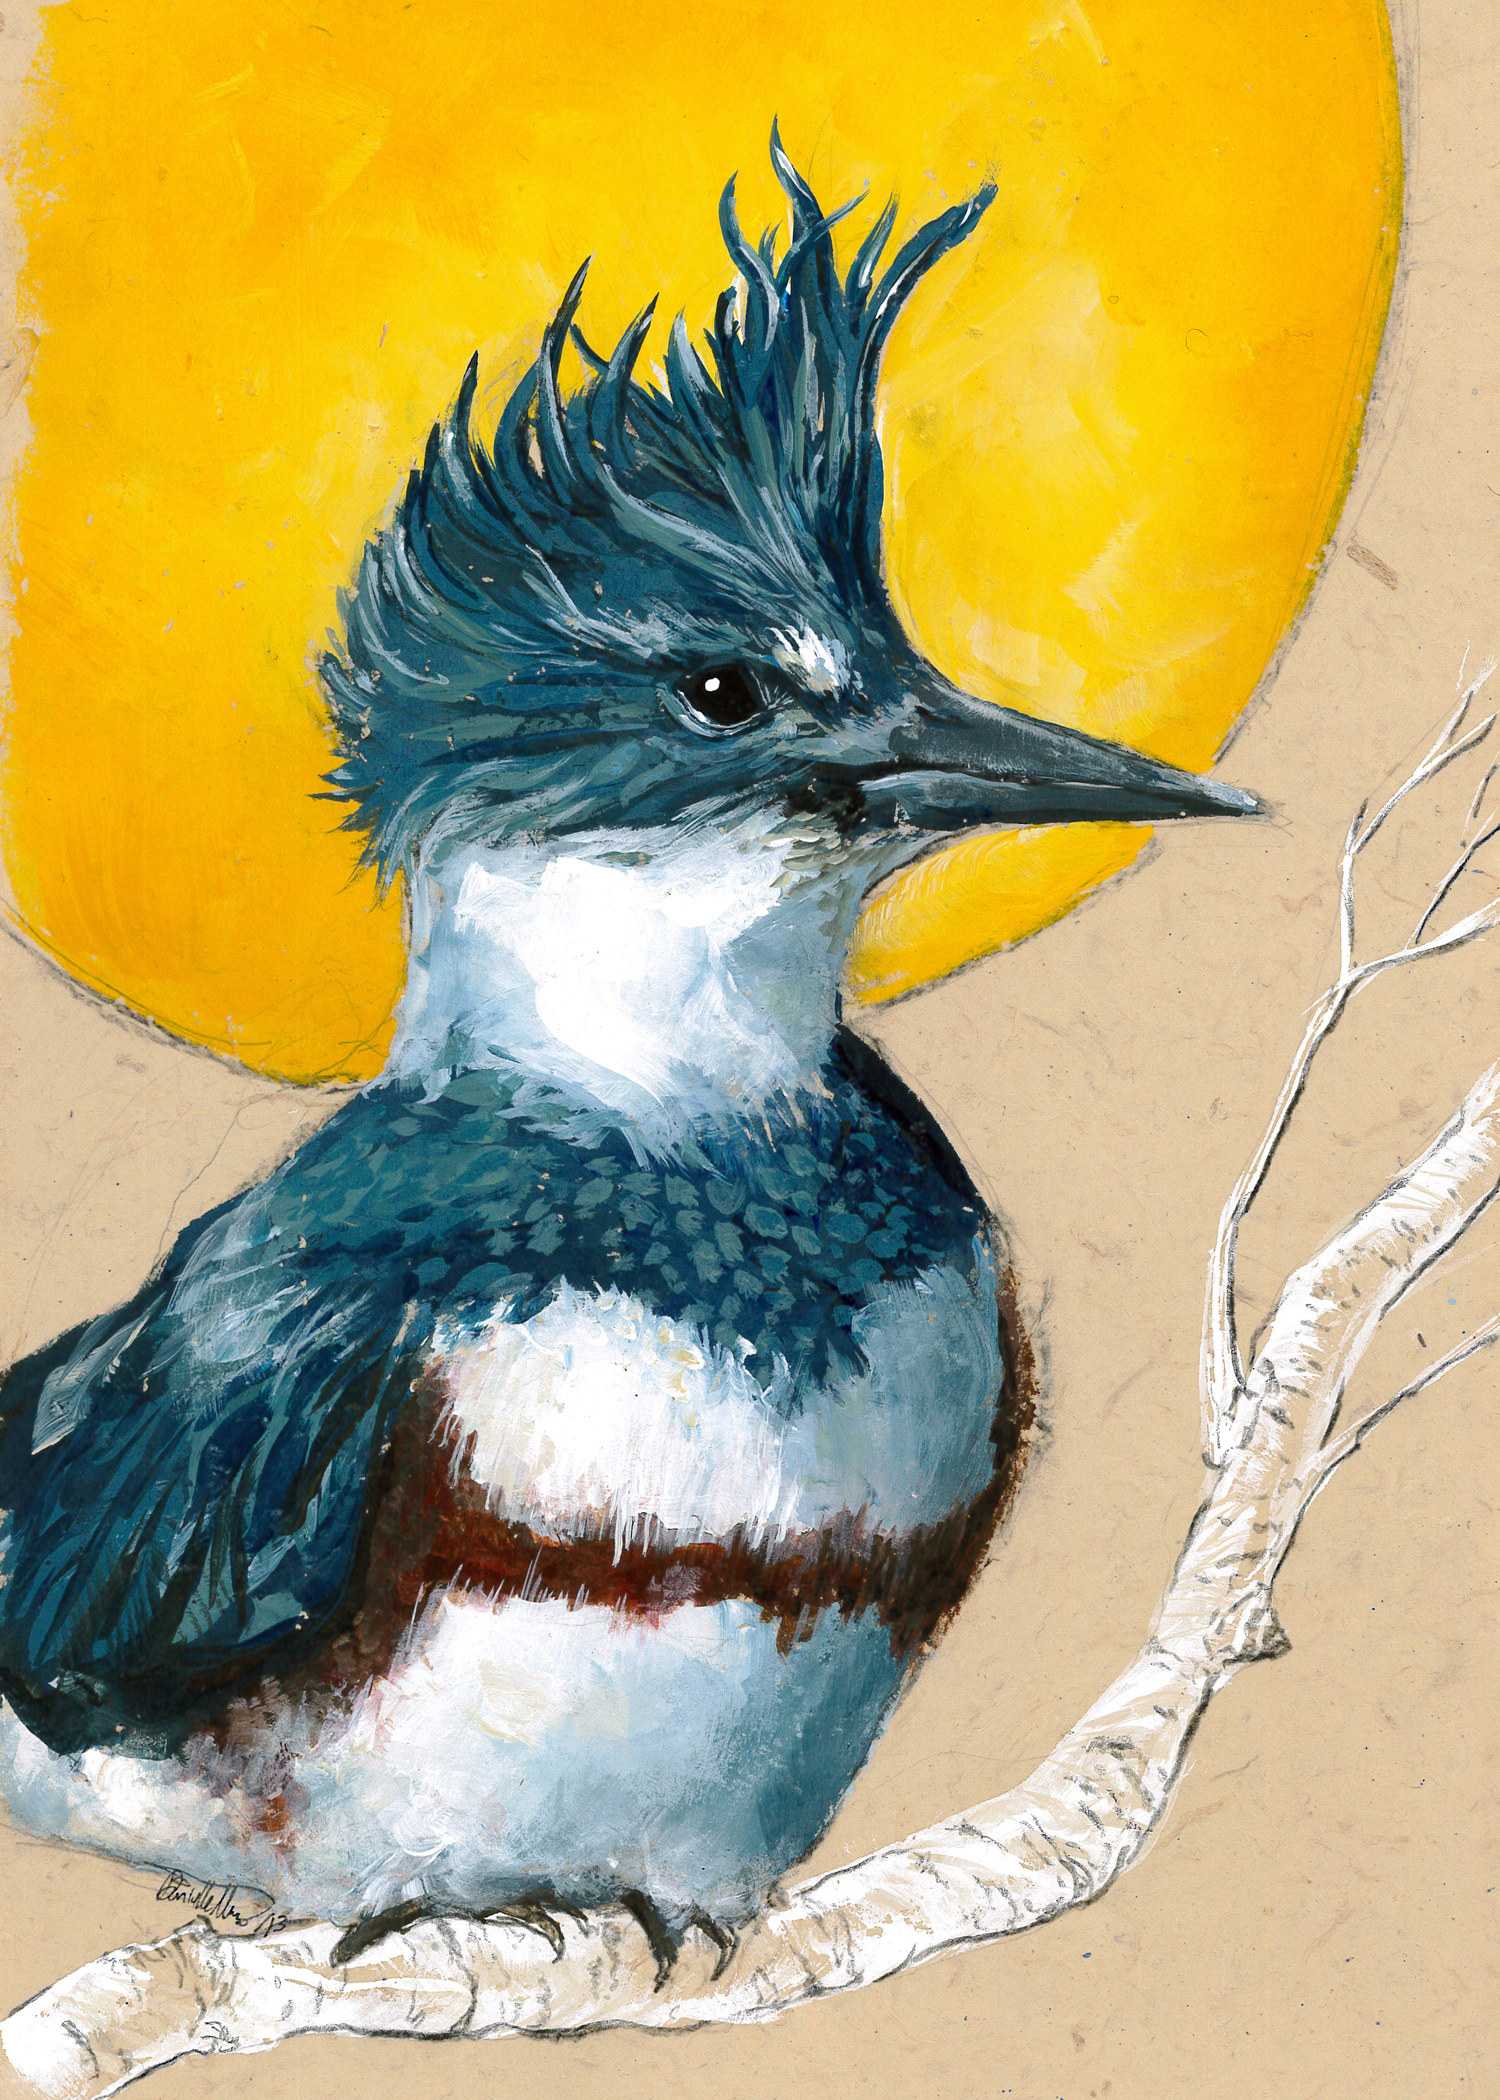 kingfisher5x7.jpg